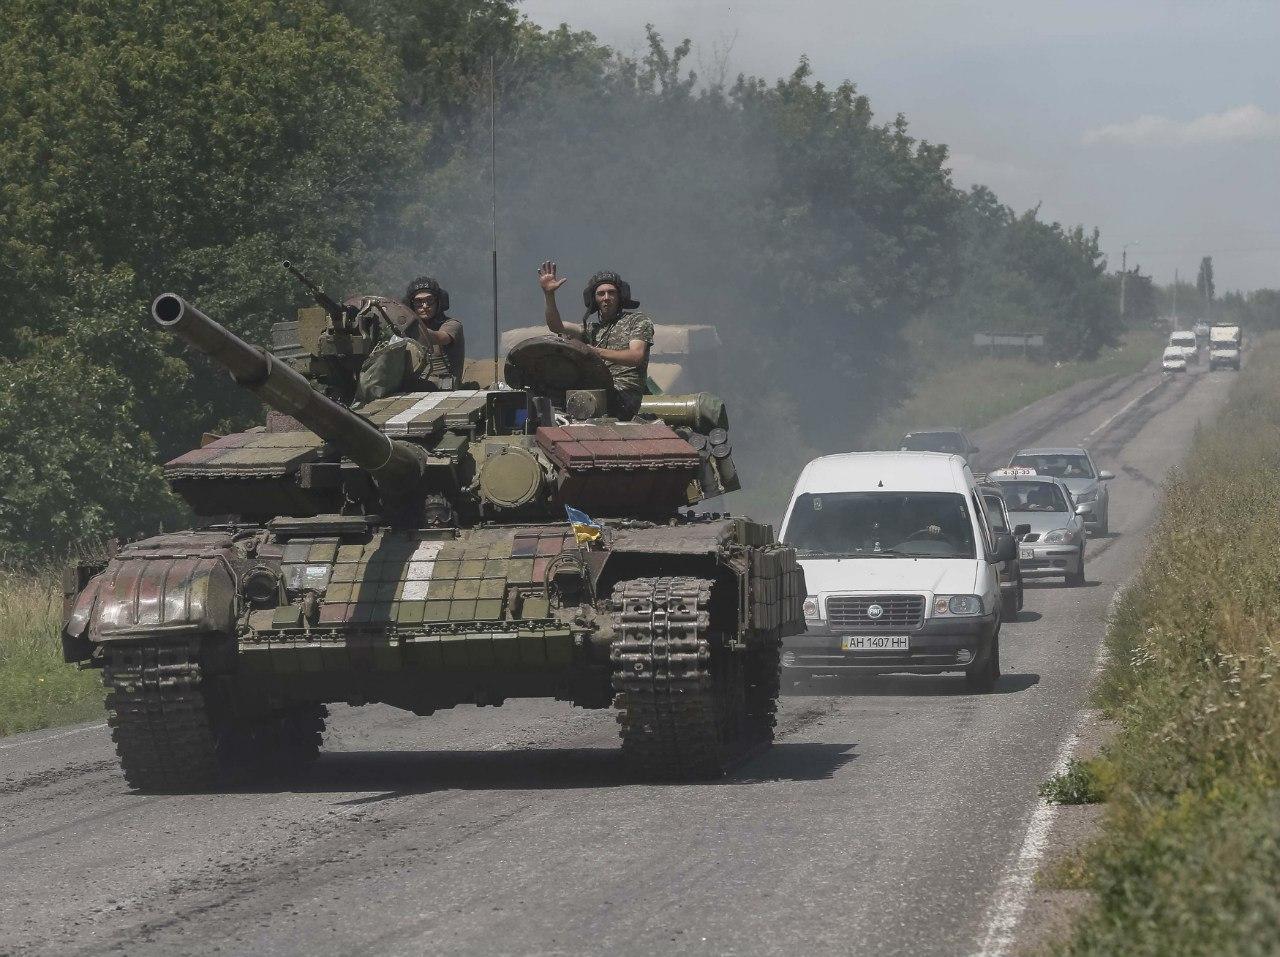 Танки движутся от Константиновки в сторону Донецка